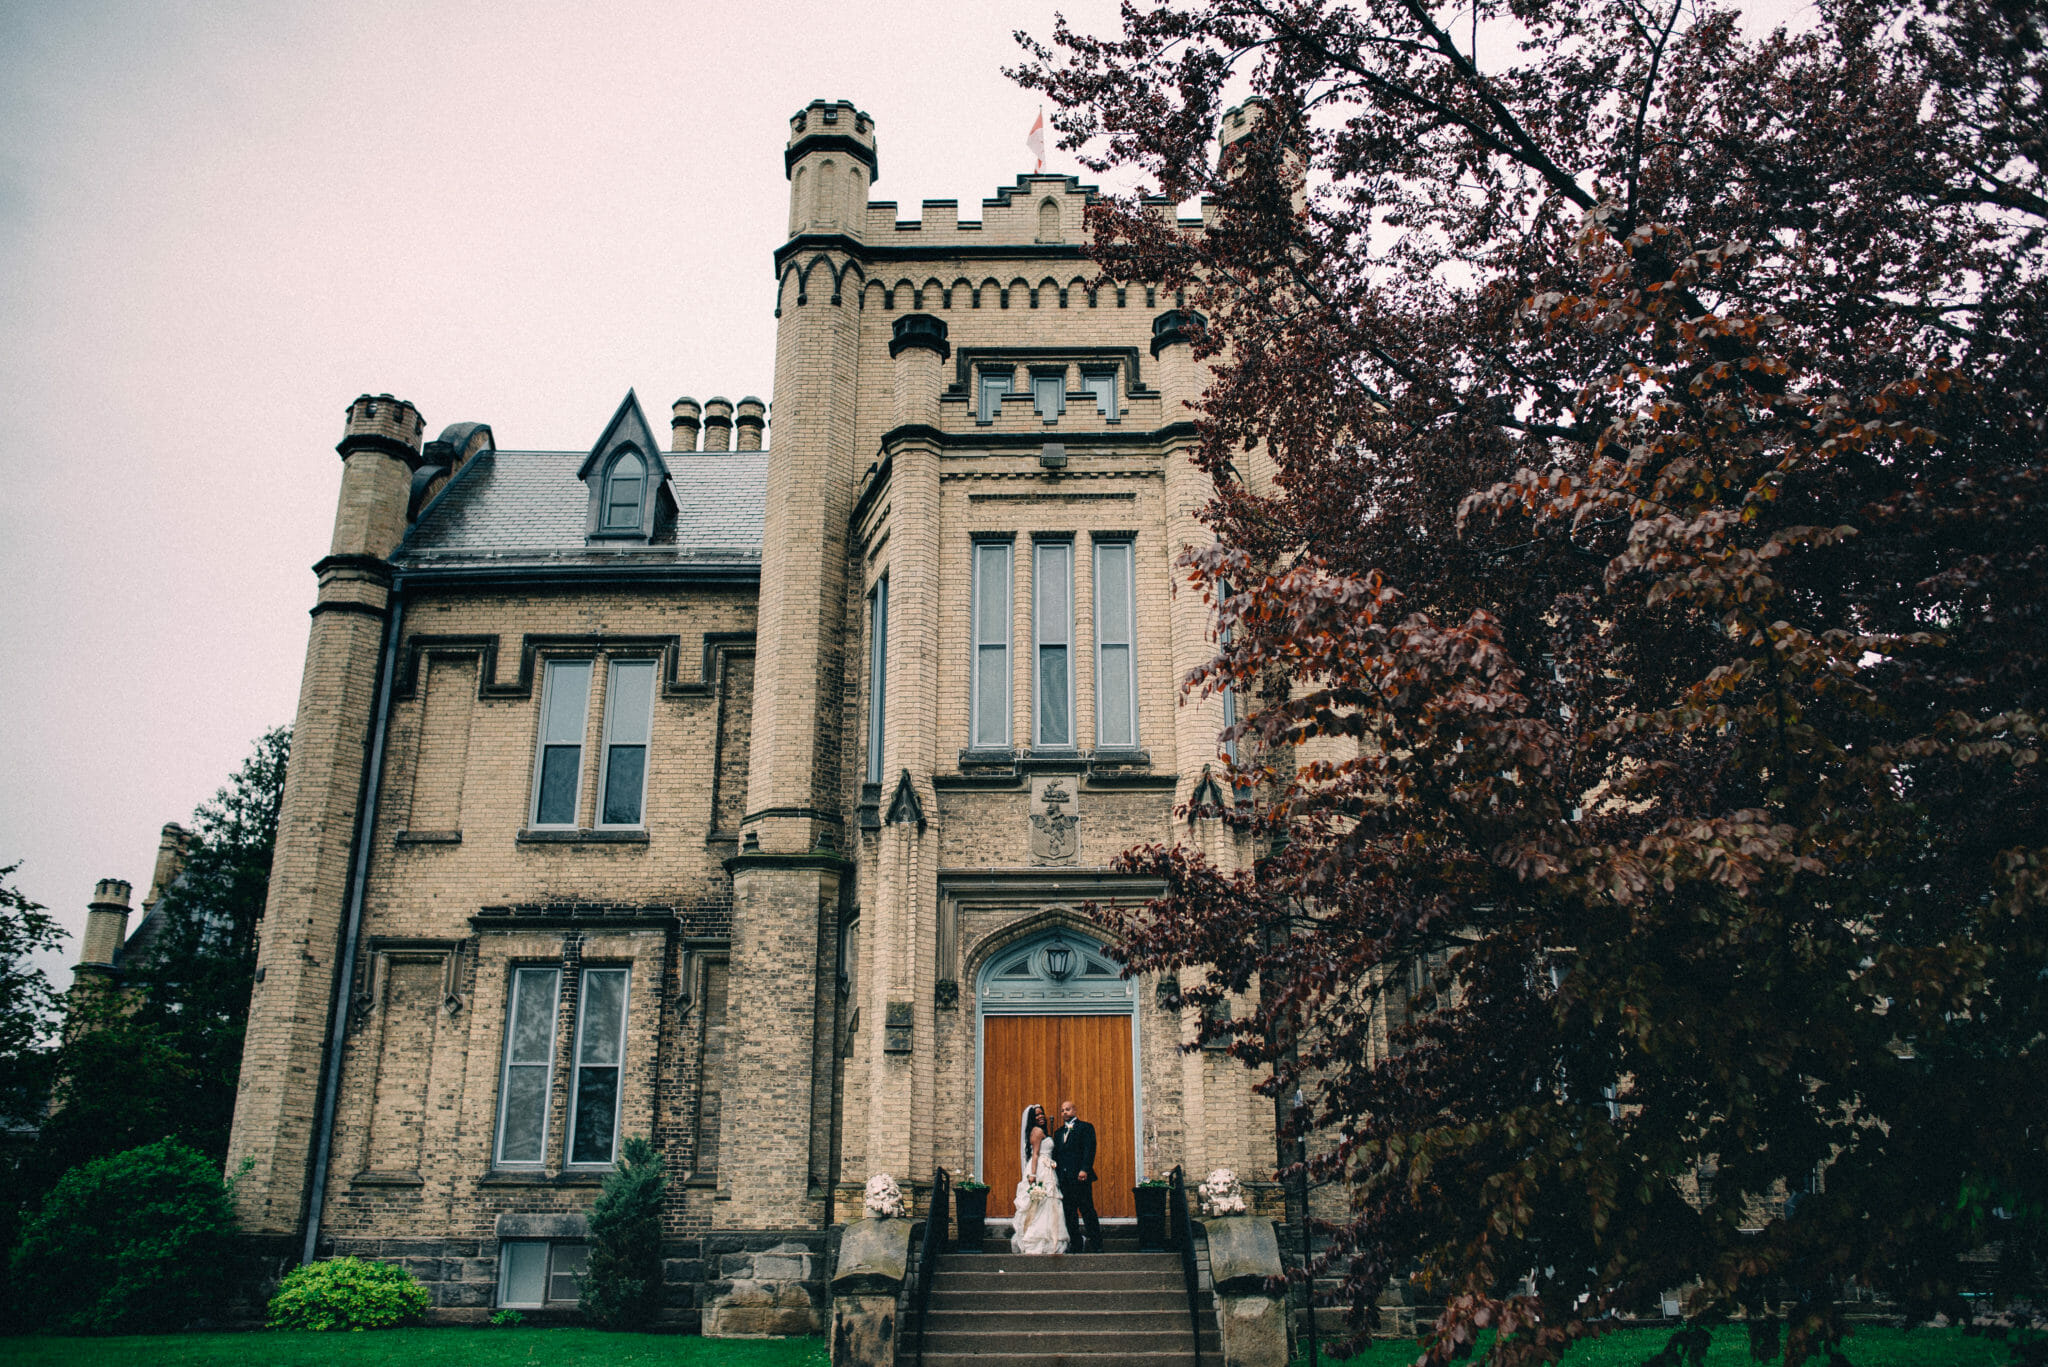 landscape photo of trafalgar castle school with bride and groom